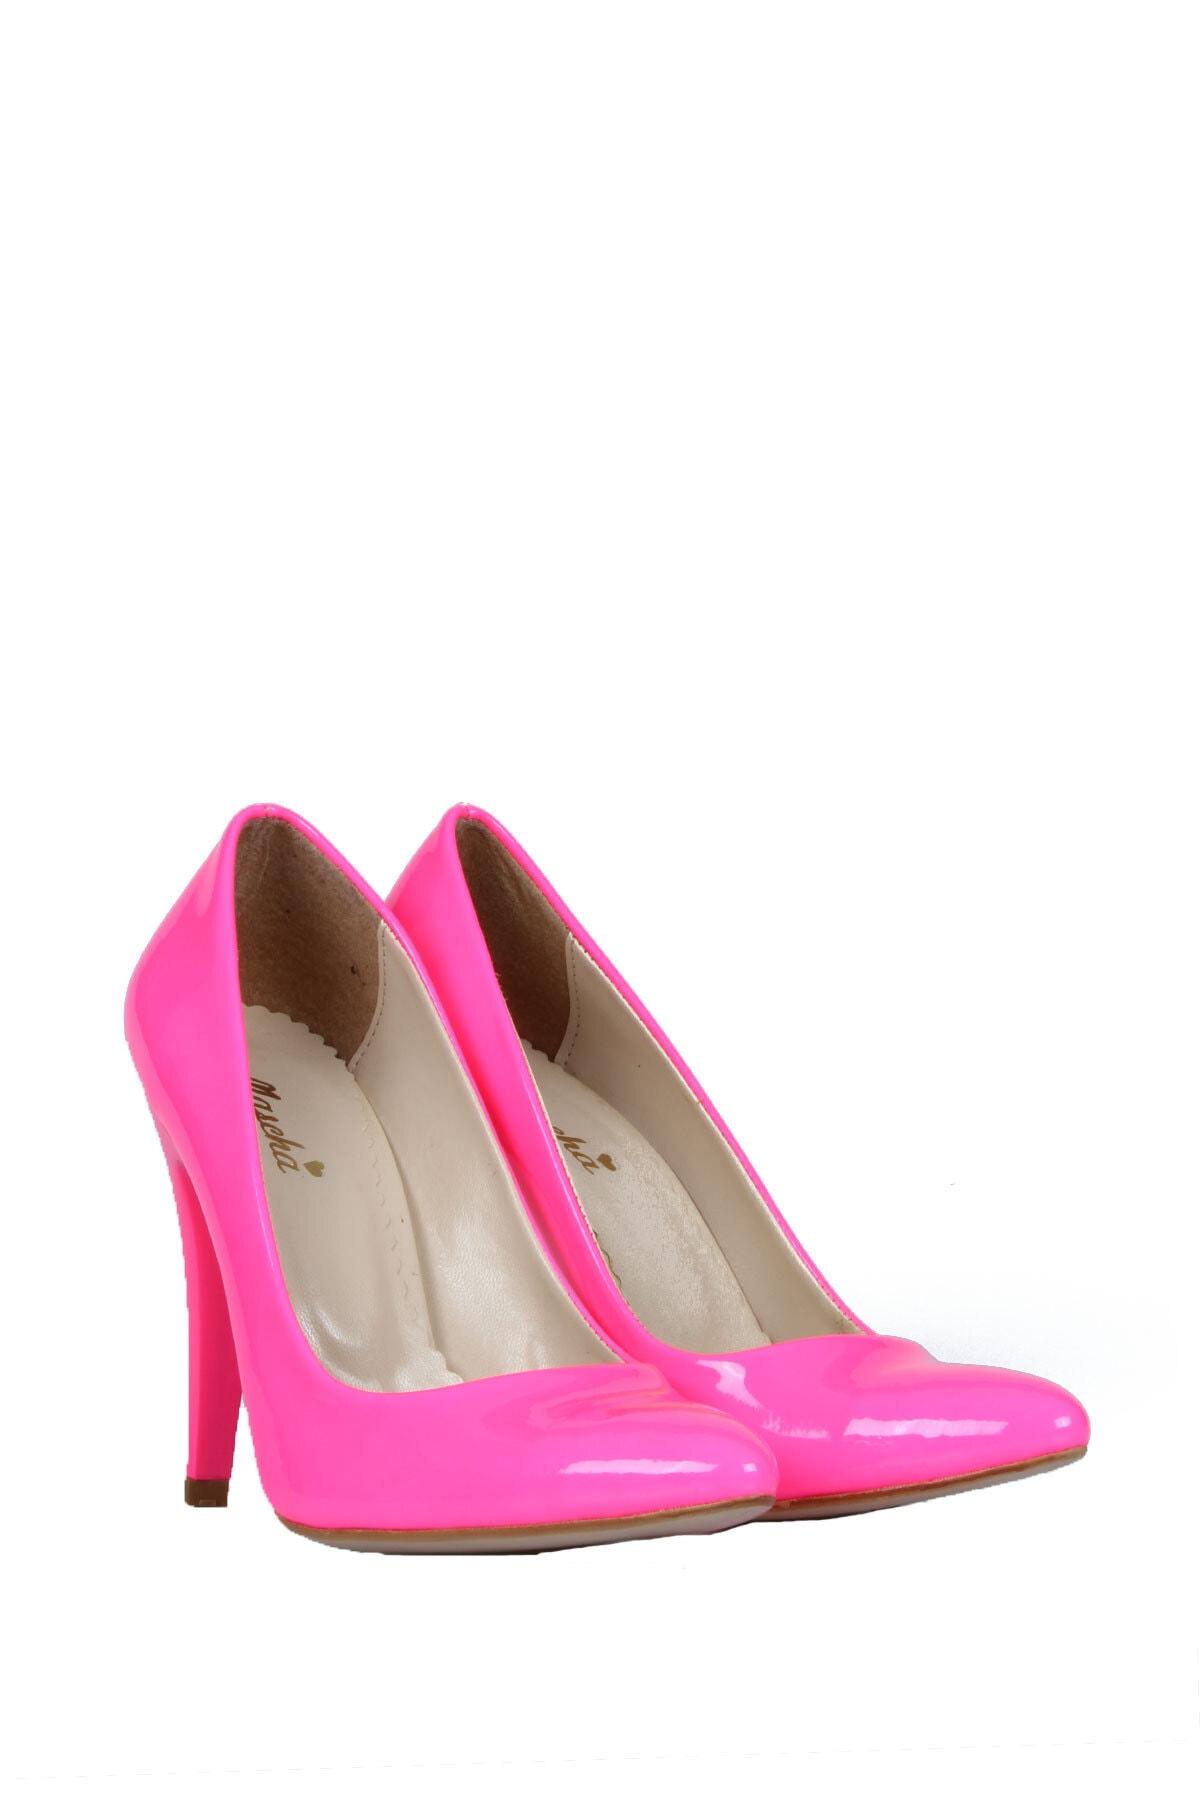 PUNTO Kadın Pembe Topuklu Ayakkabı 1